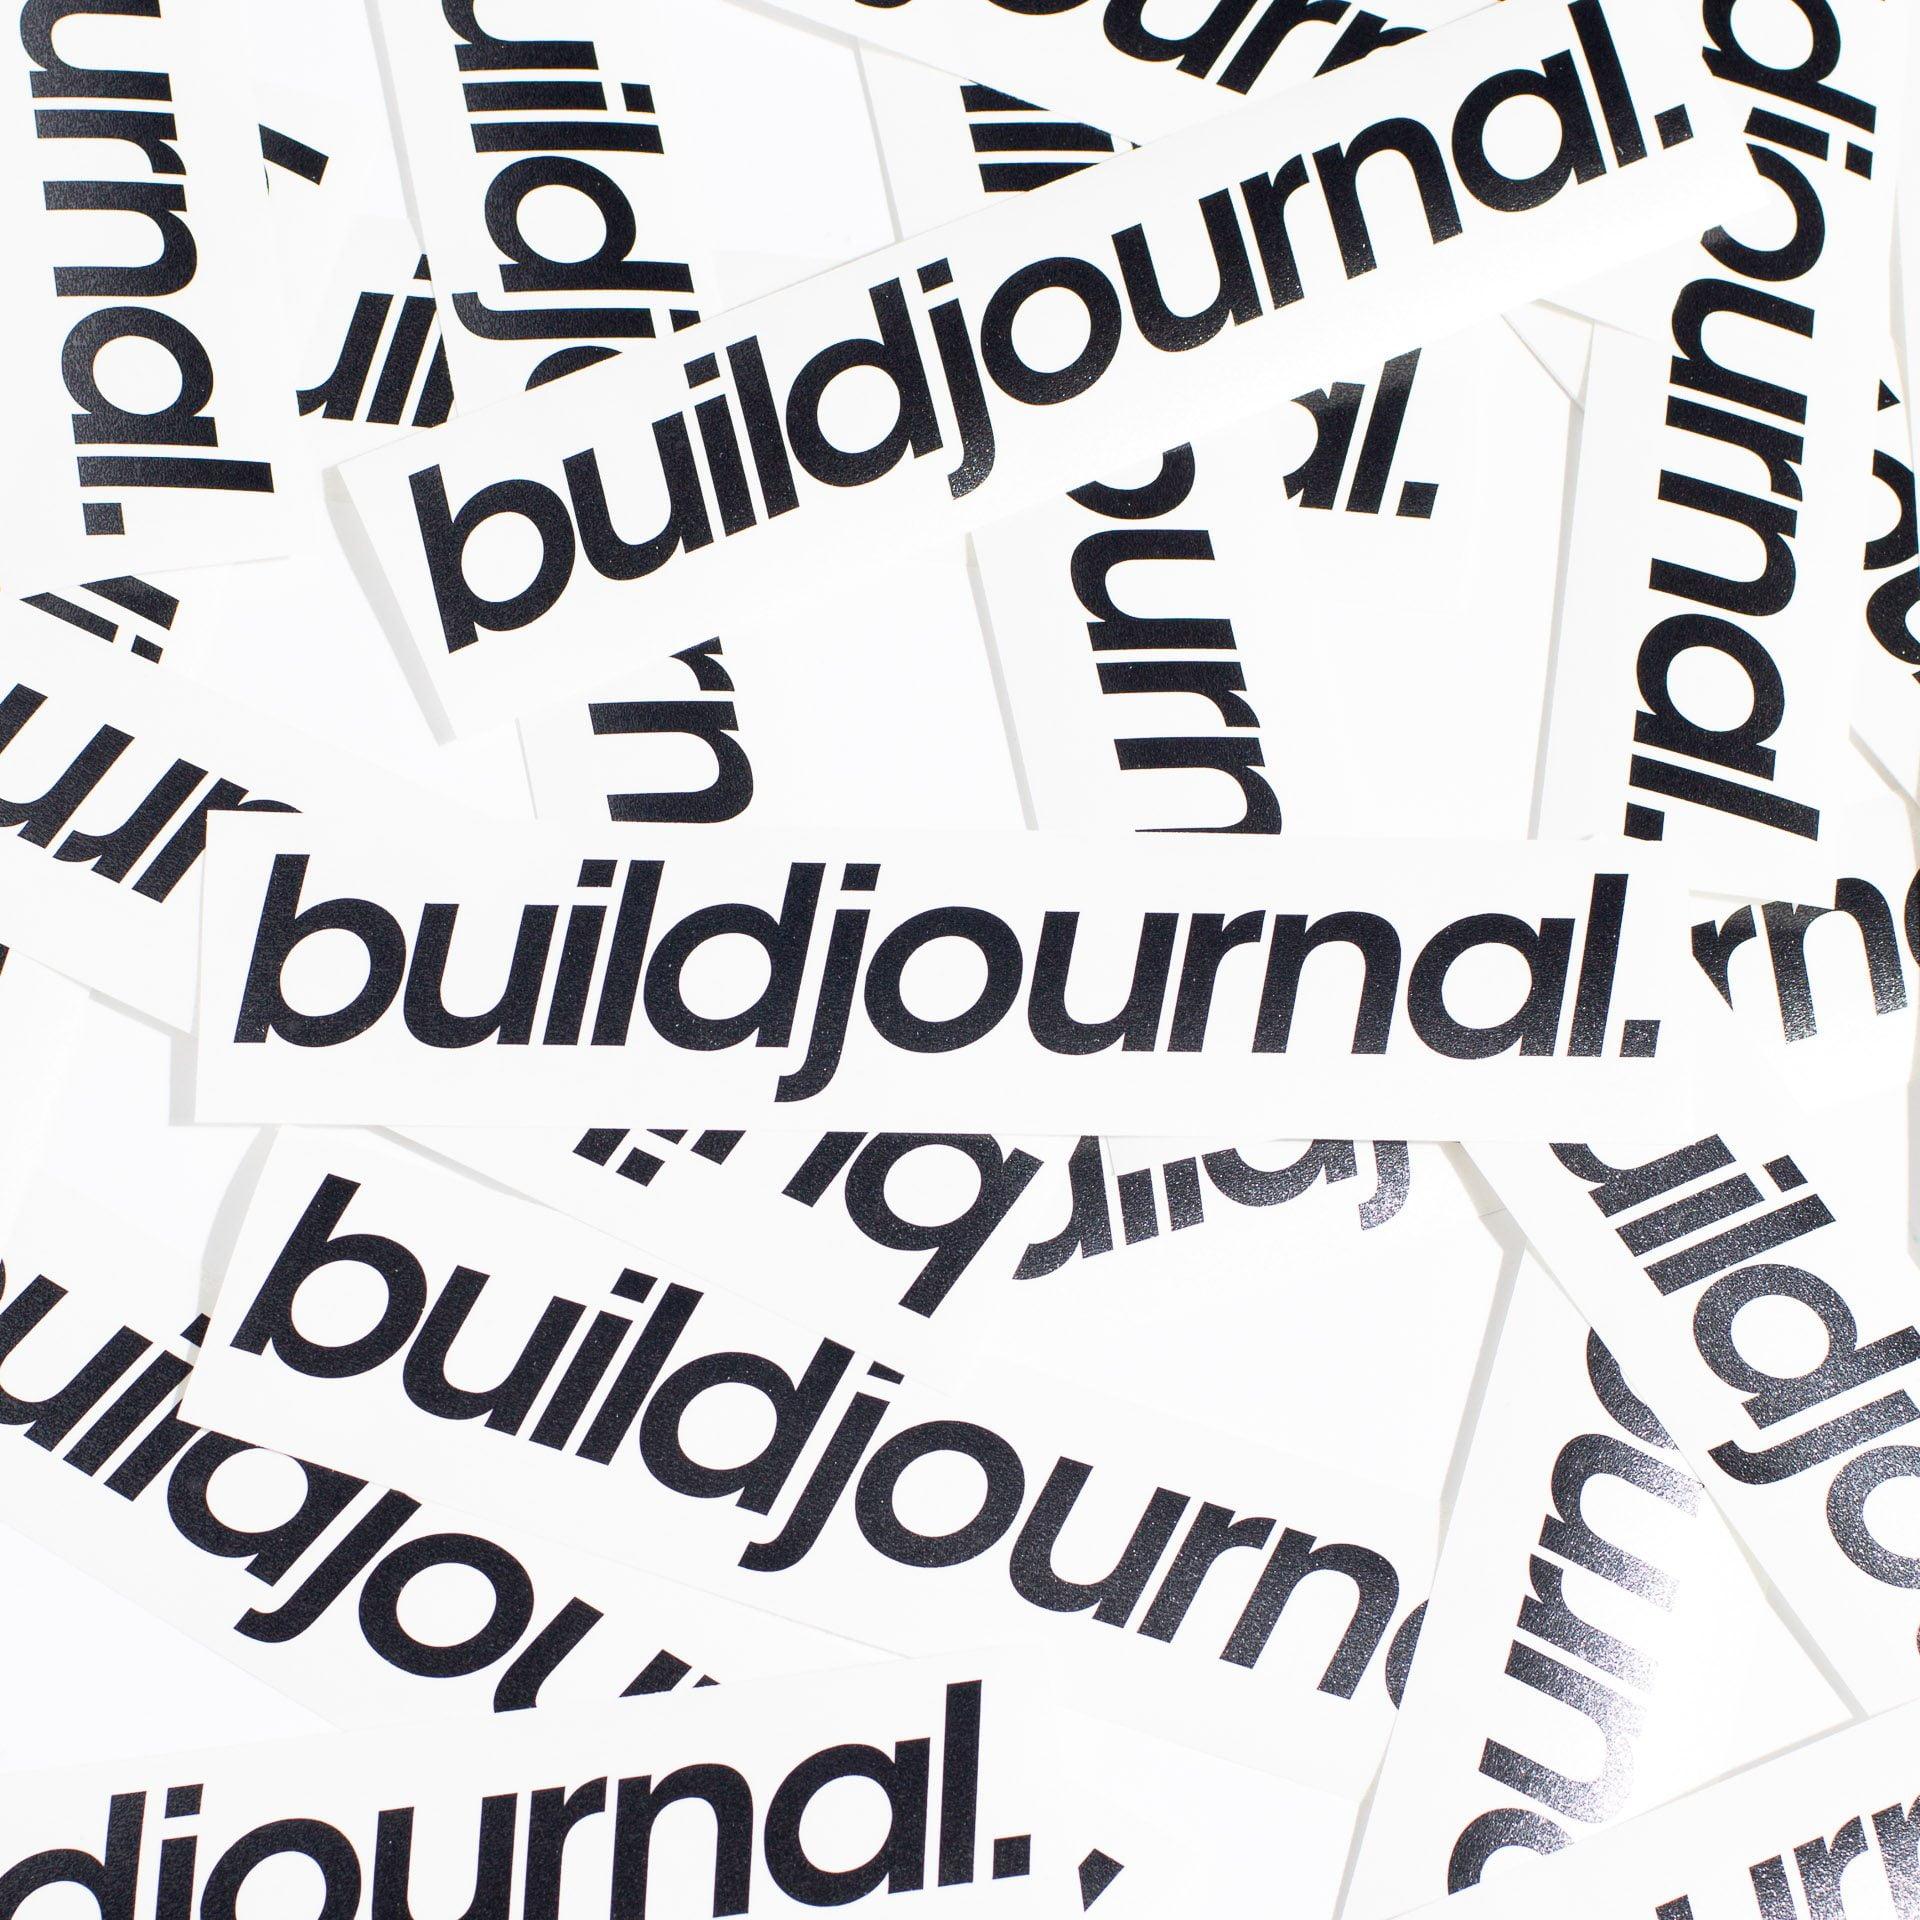 "Buildjournal 8.5"" Die Cut Sticker Black"